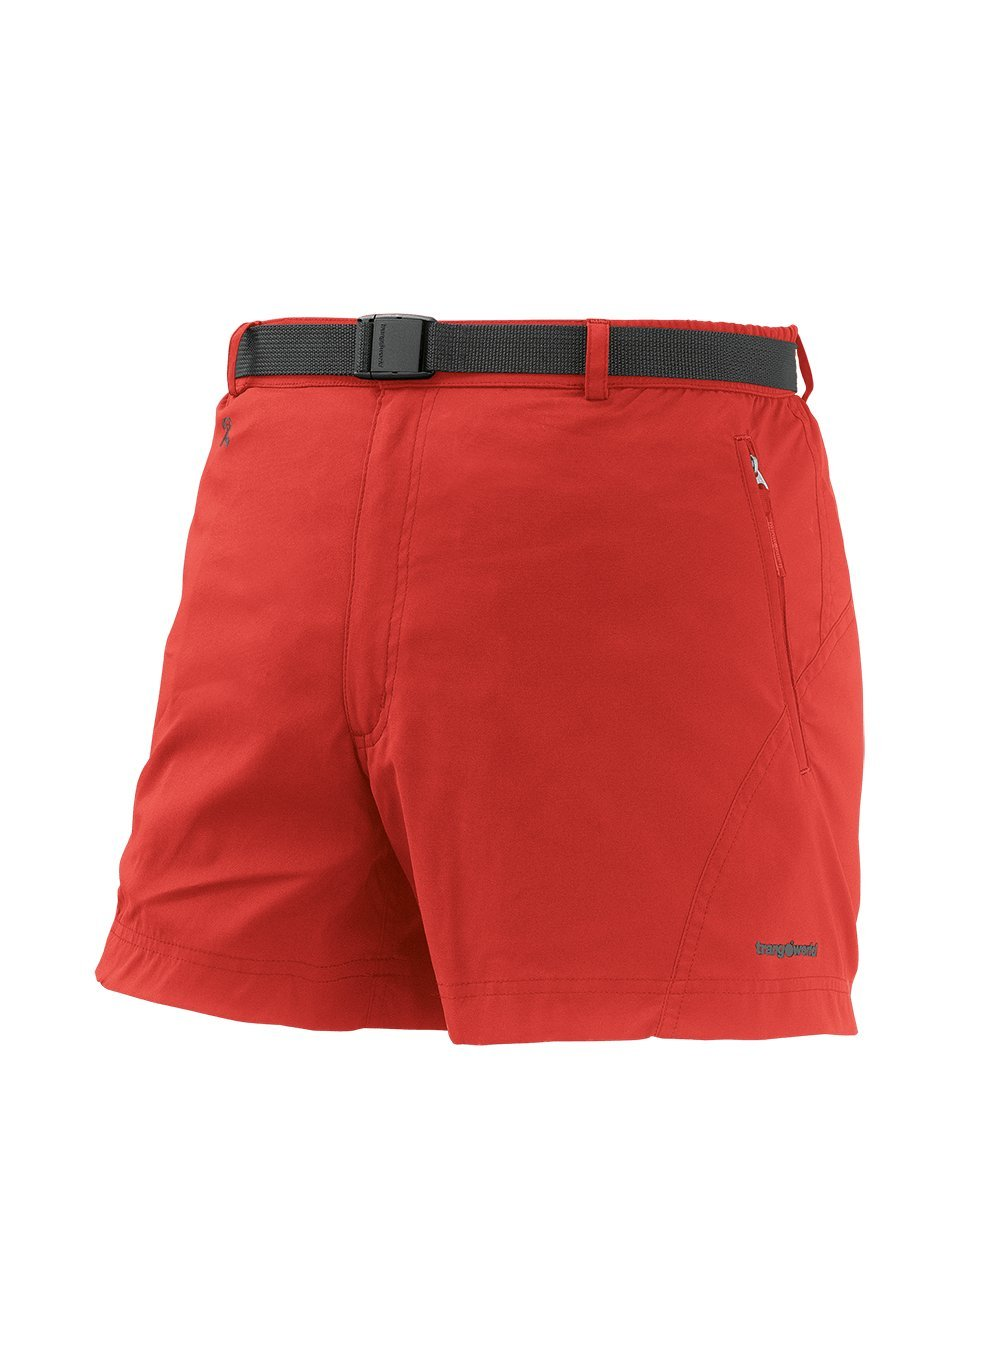 Trangoworld Isar Shorts, Kurze XXXL rot (volcan)